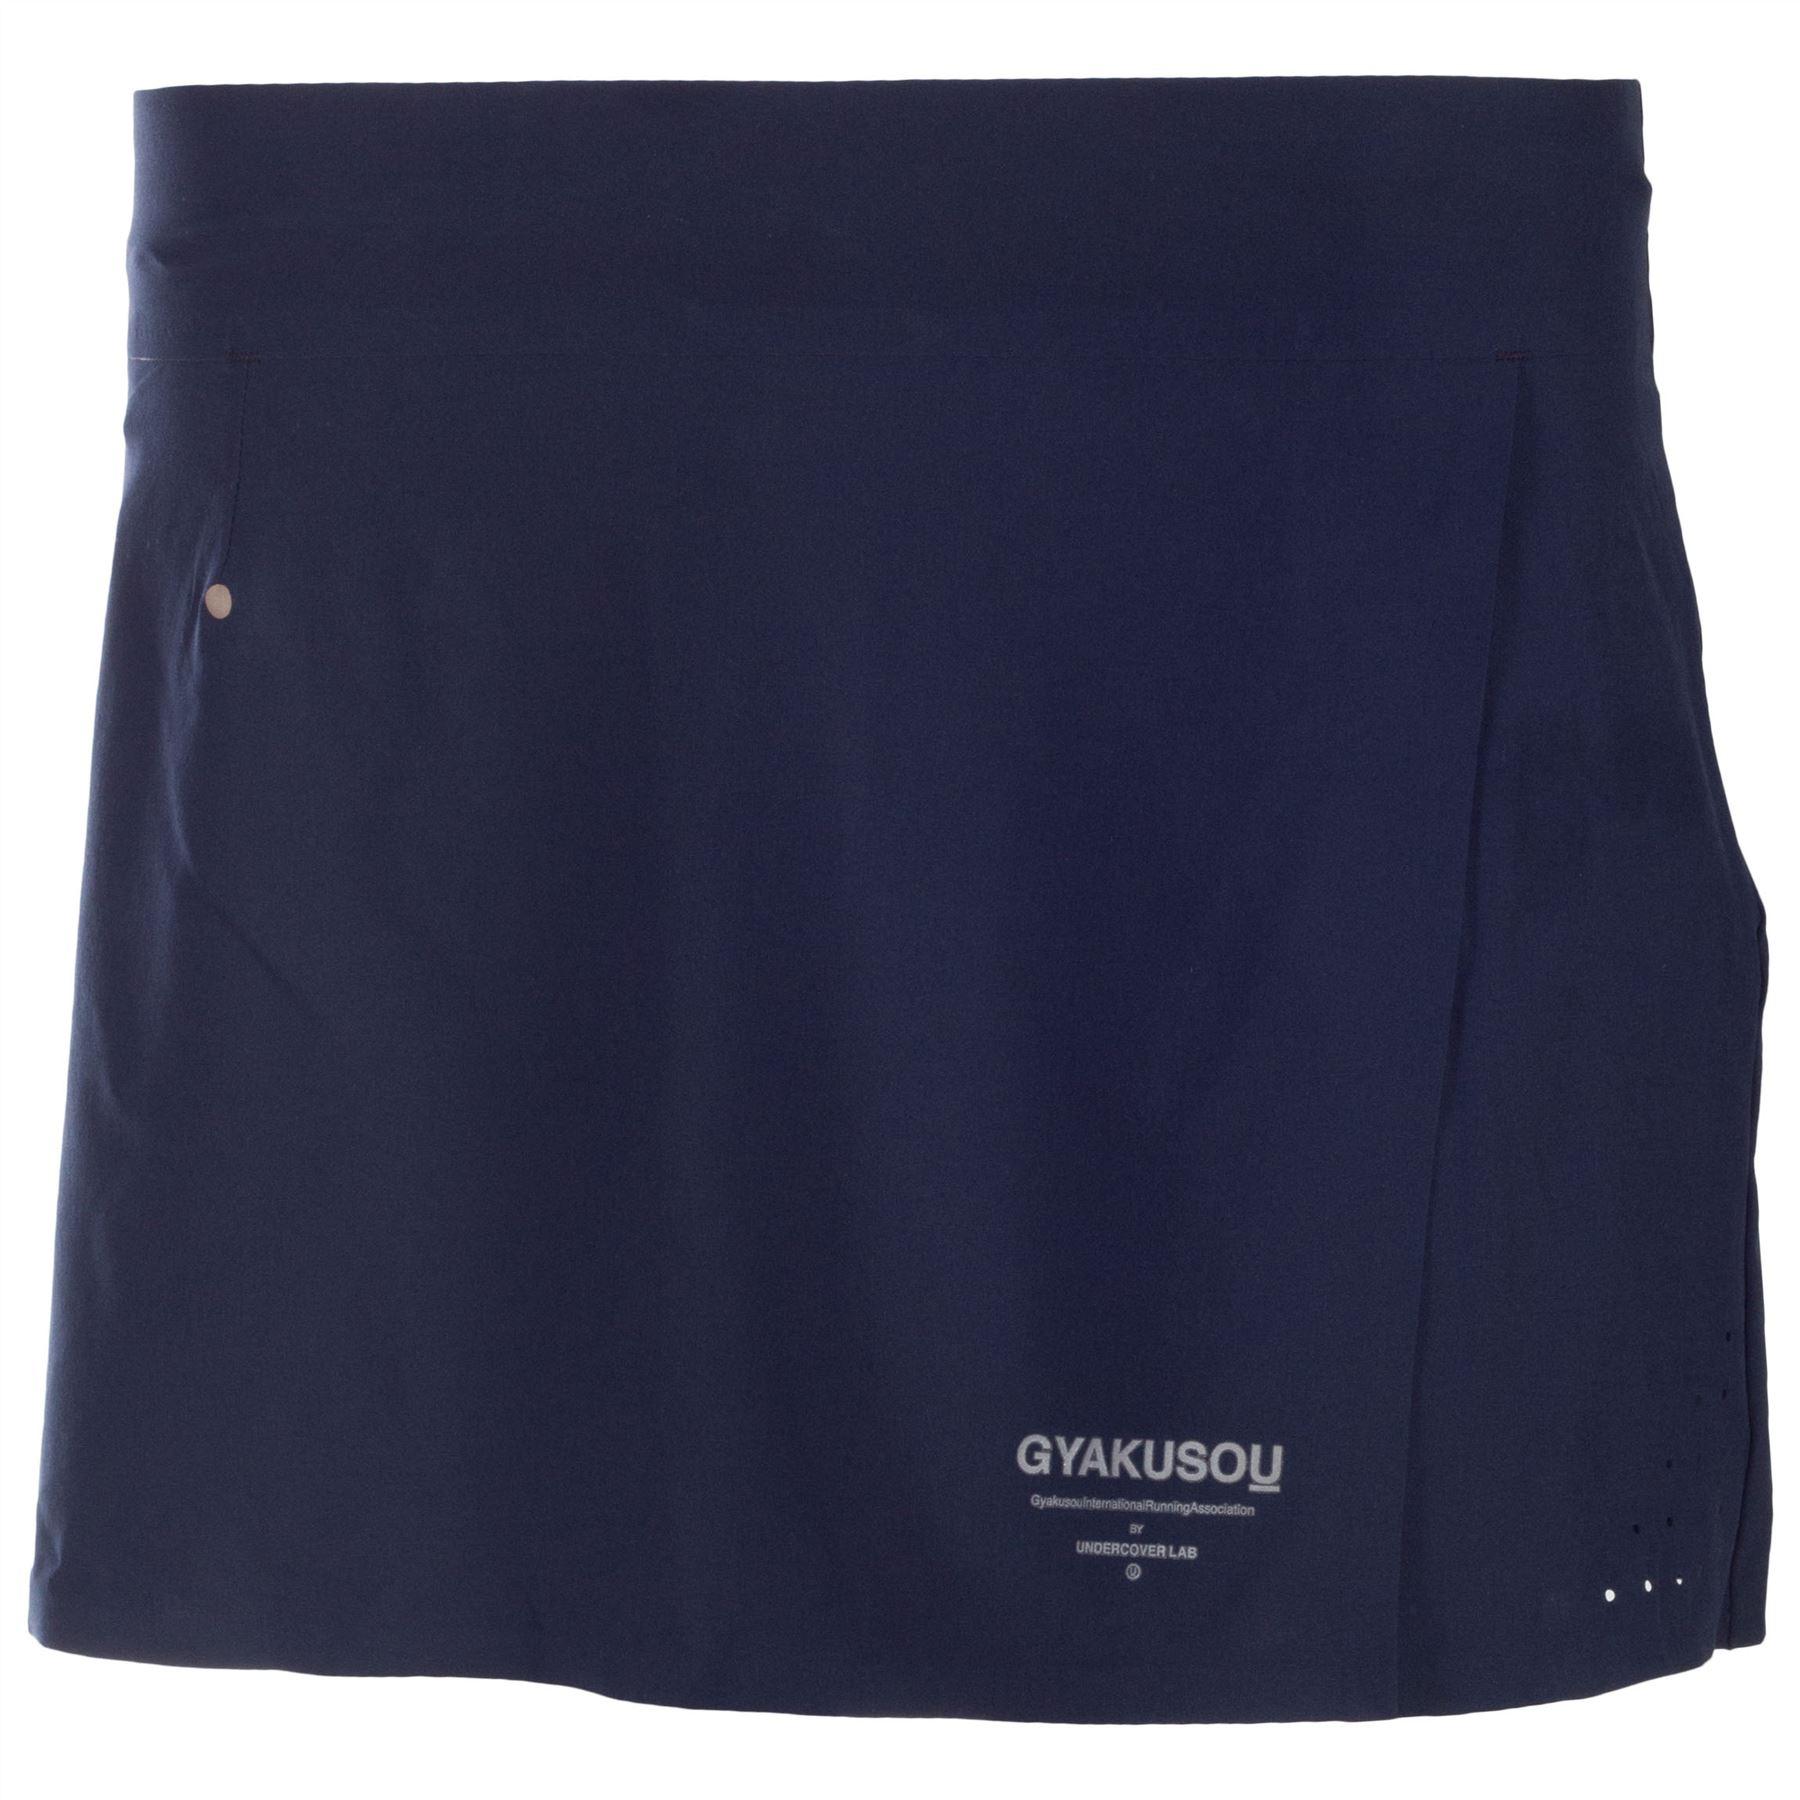 nike women s gyakusou df convertible skirt shorts running